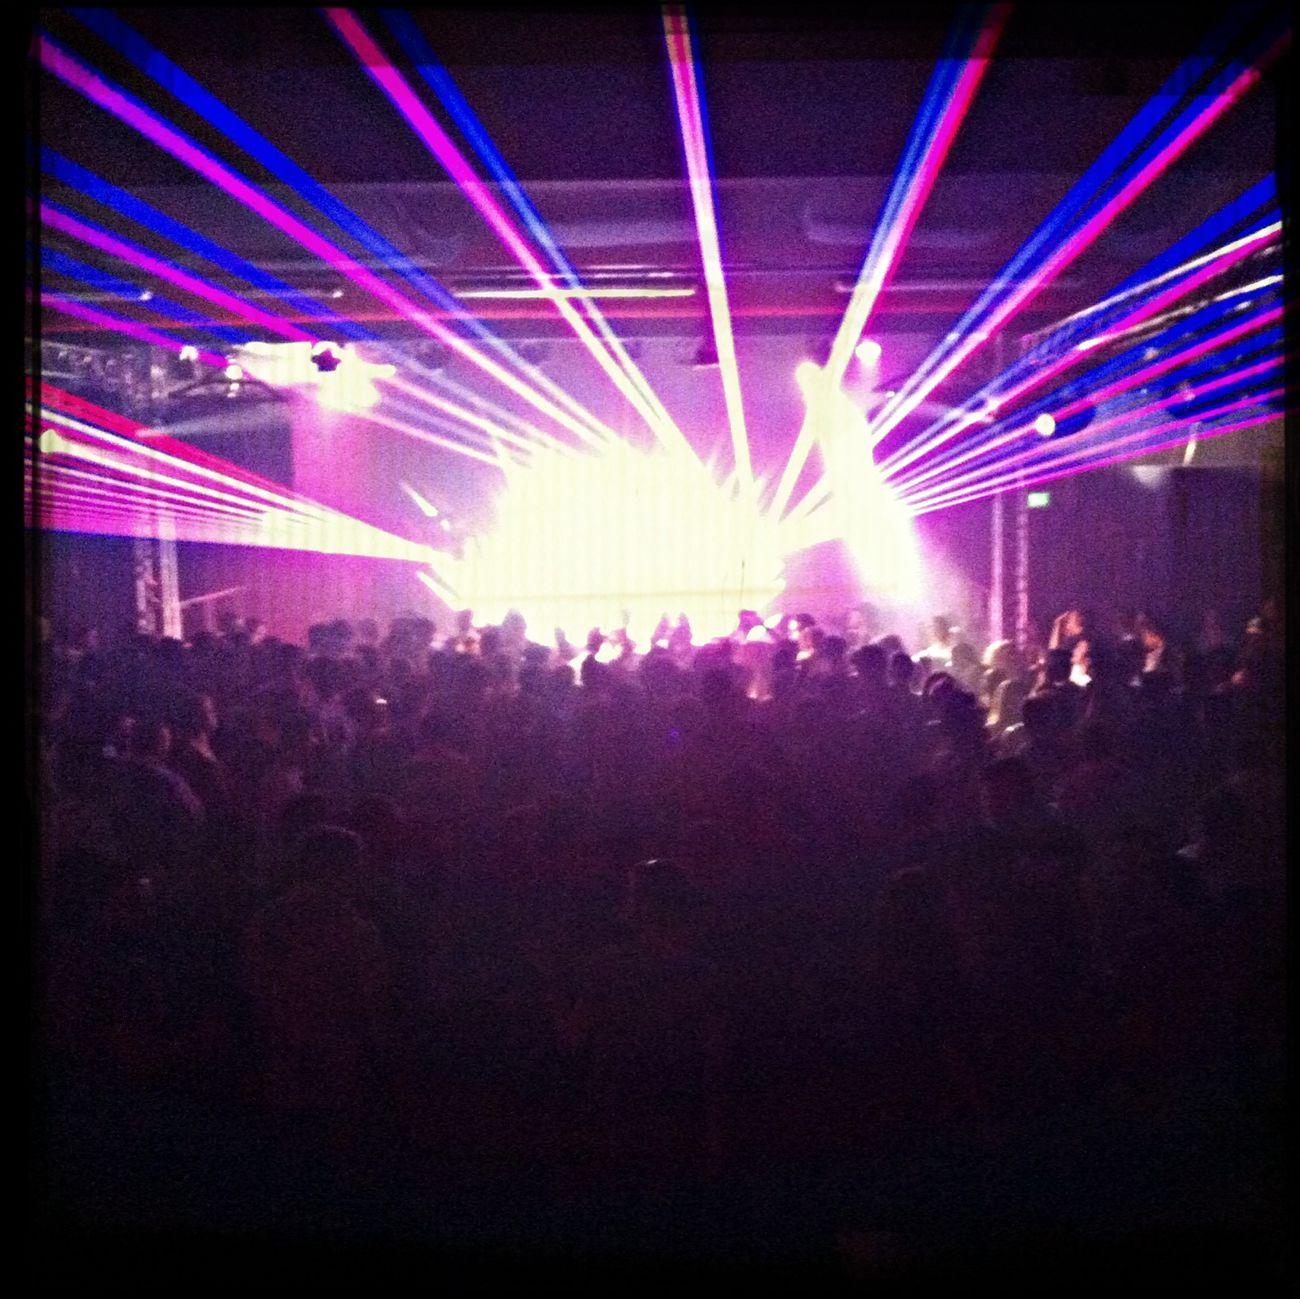 03:25. We feel still alive!! Onlyforclubbers Housemusic Nightlovers Alternativepeople